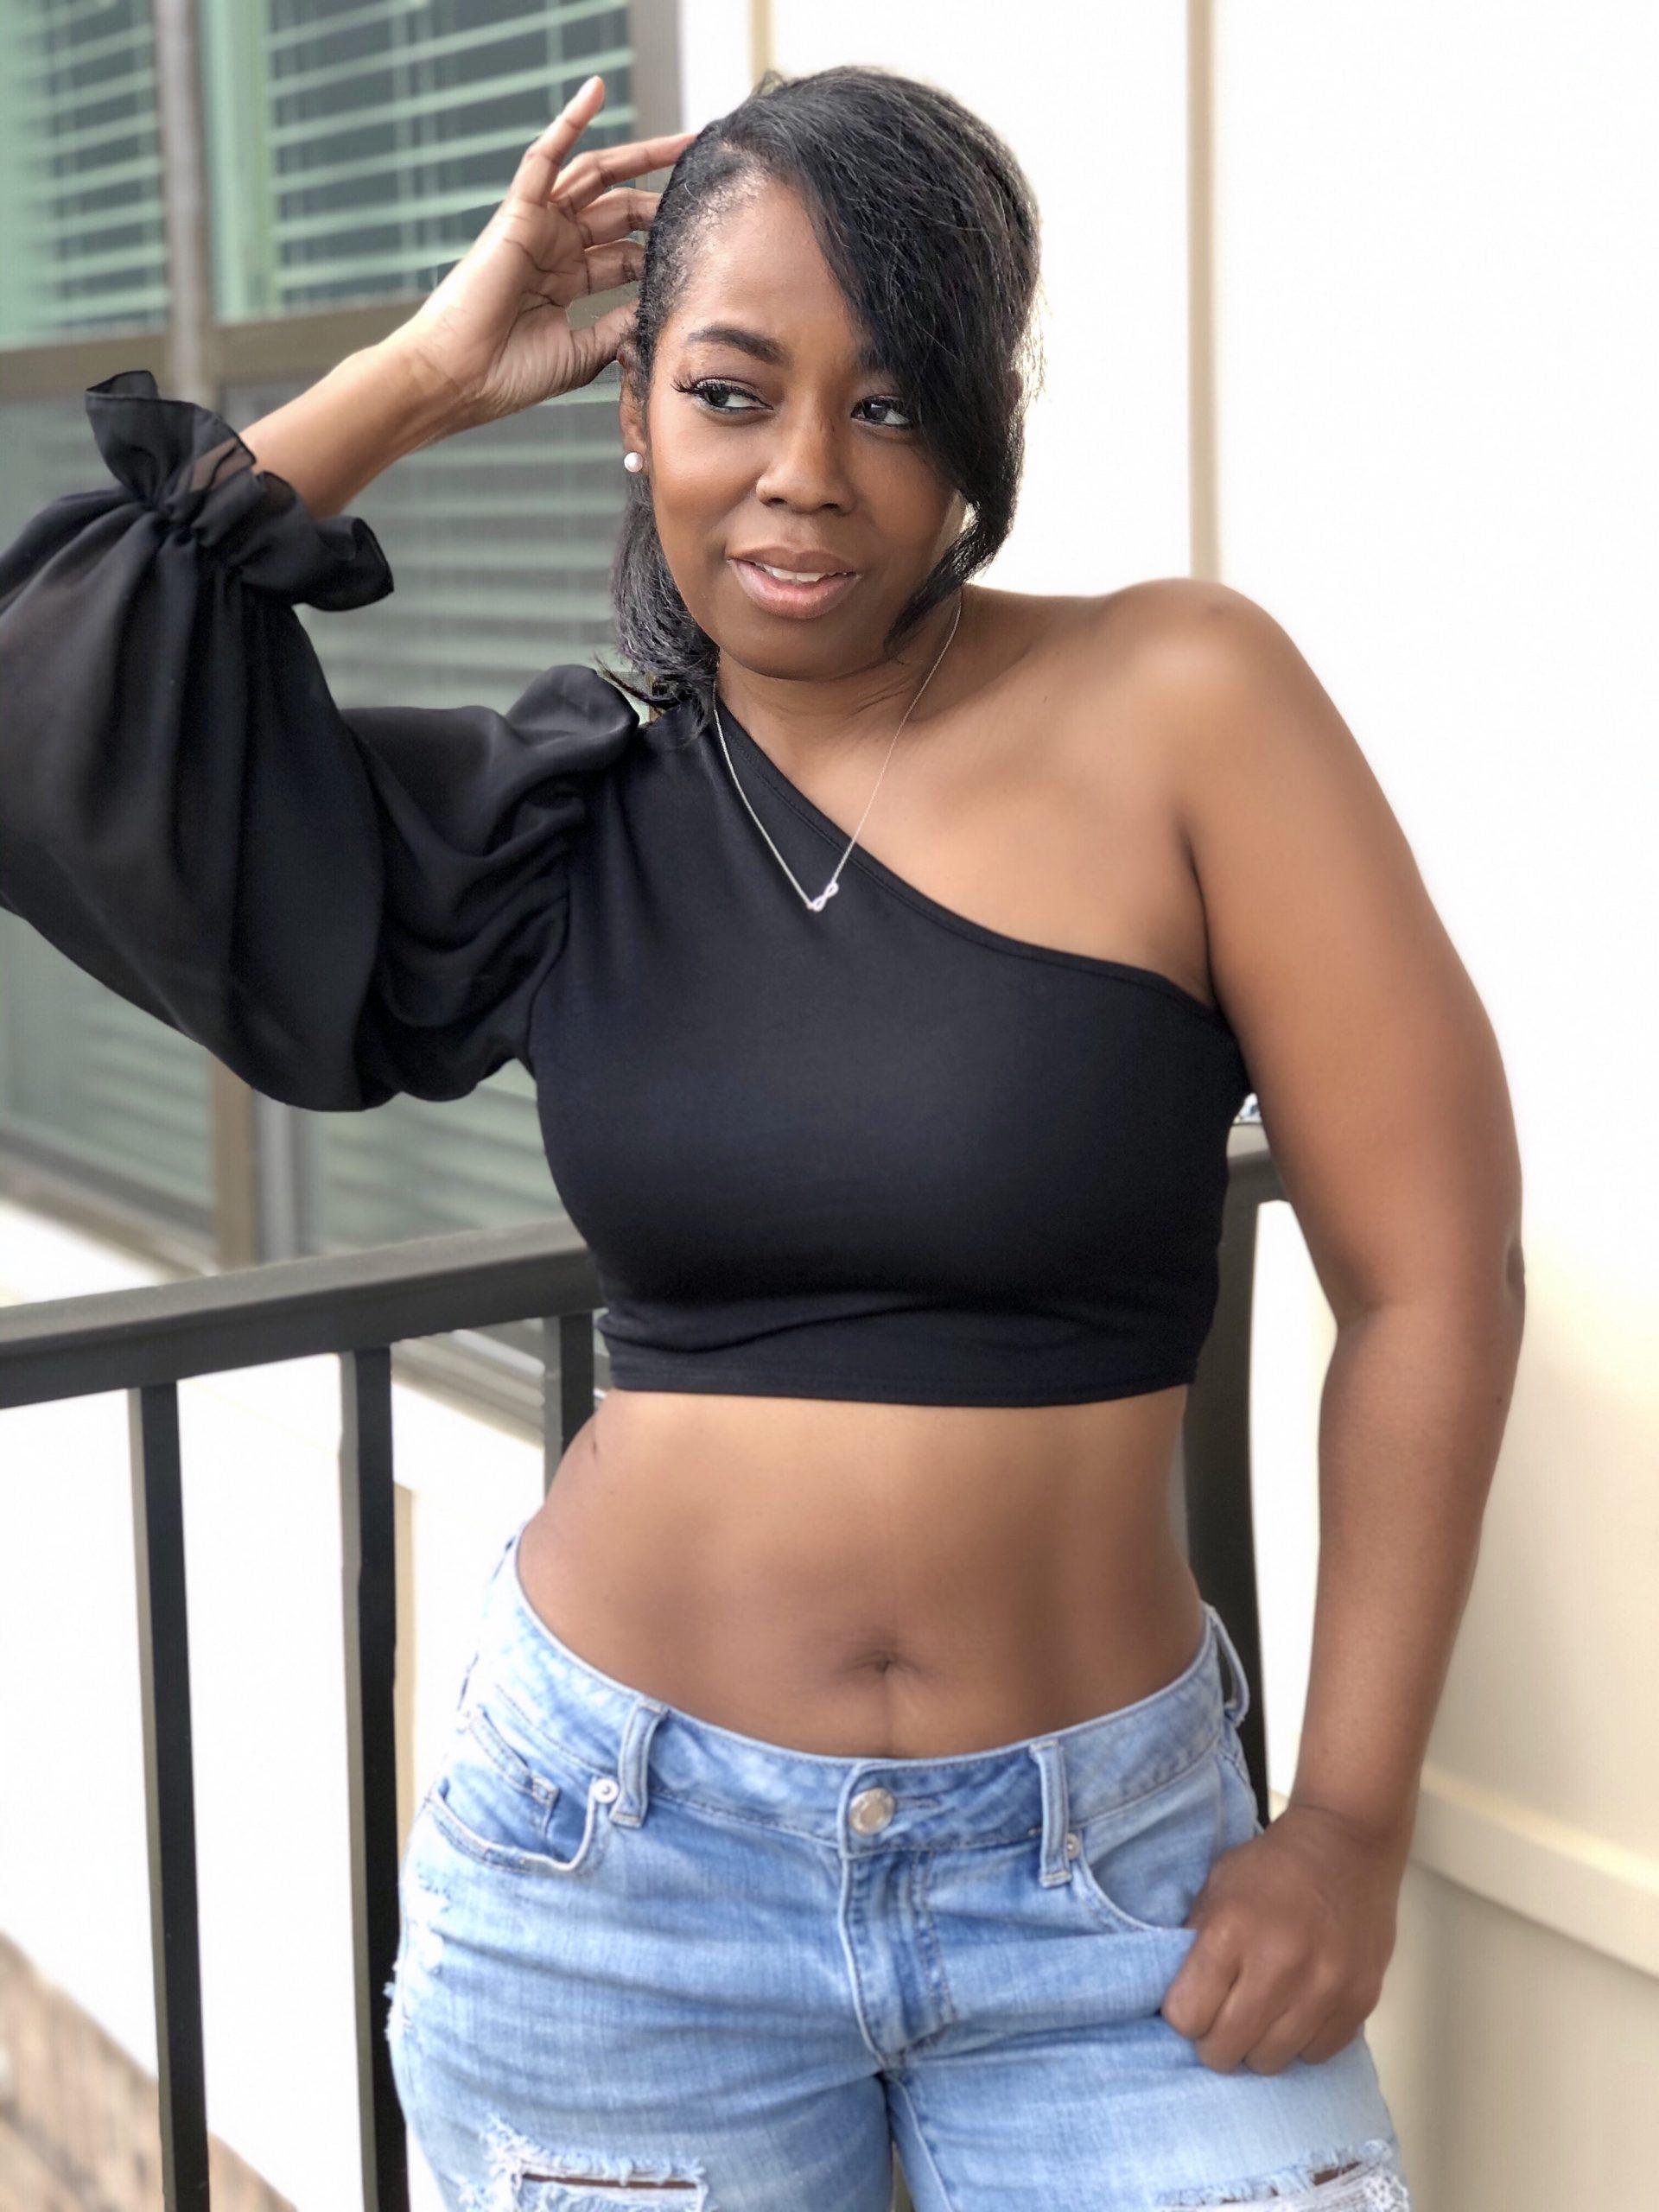 My Style: Black Mesh Puff One Sleeve Crop Top